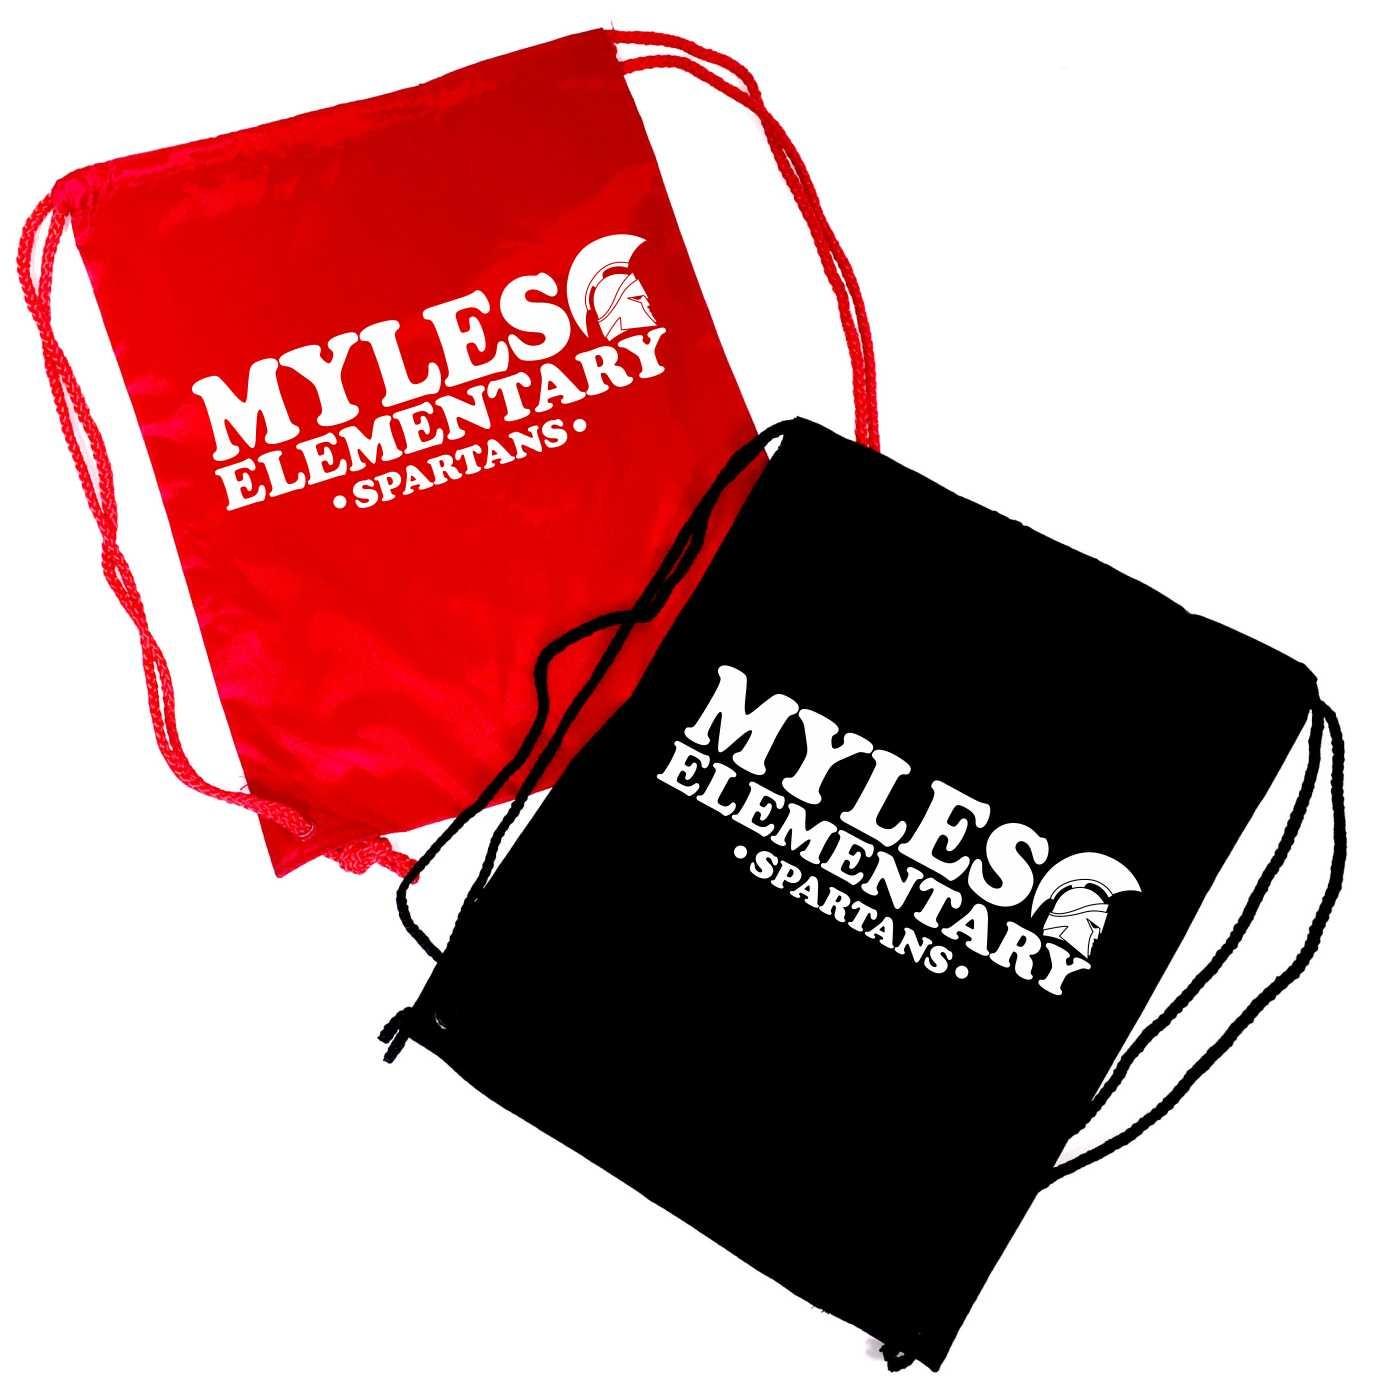 Myles Elementary Drawstring Backpack